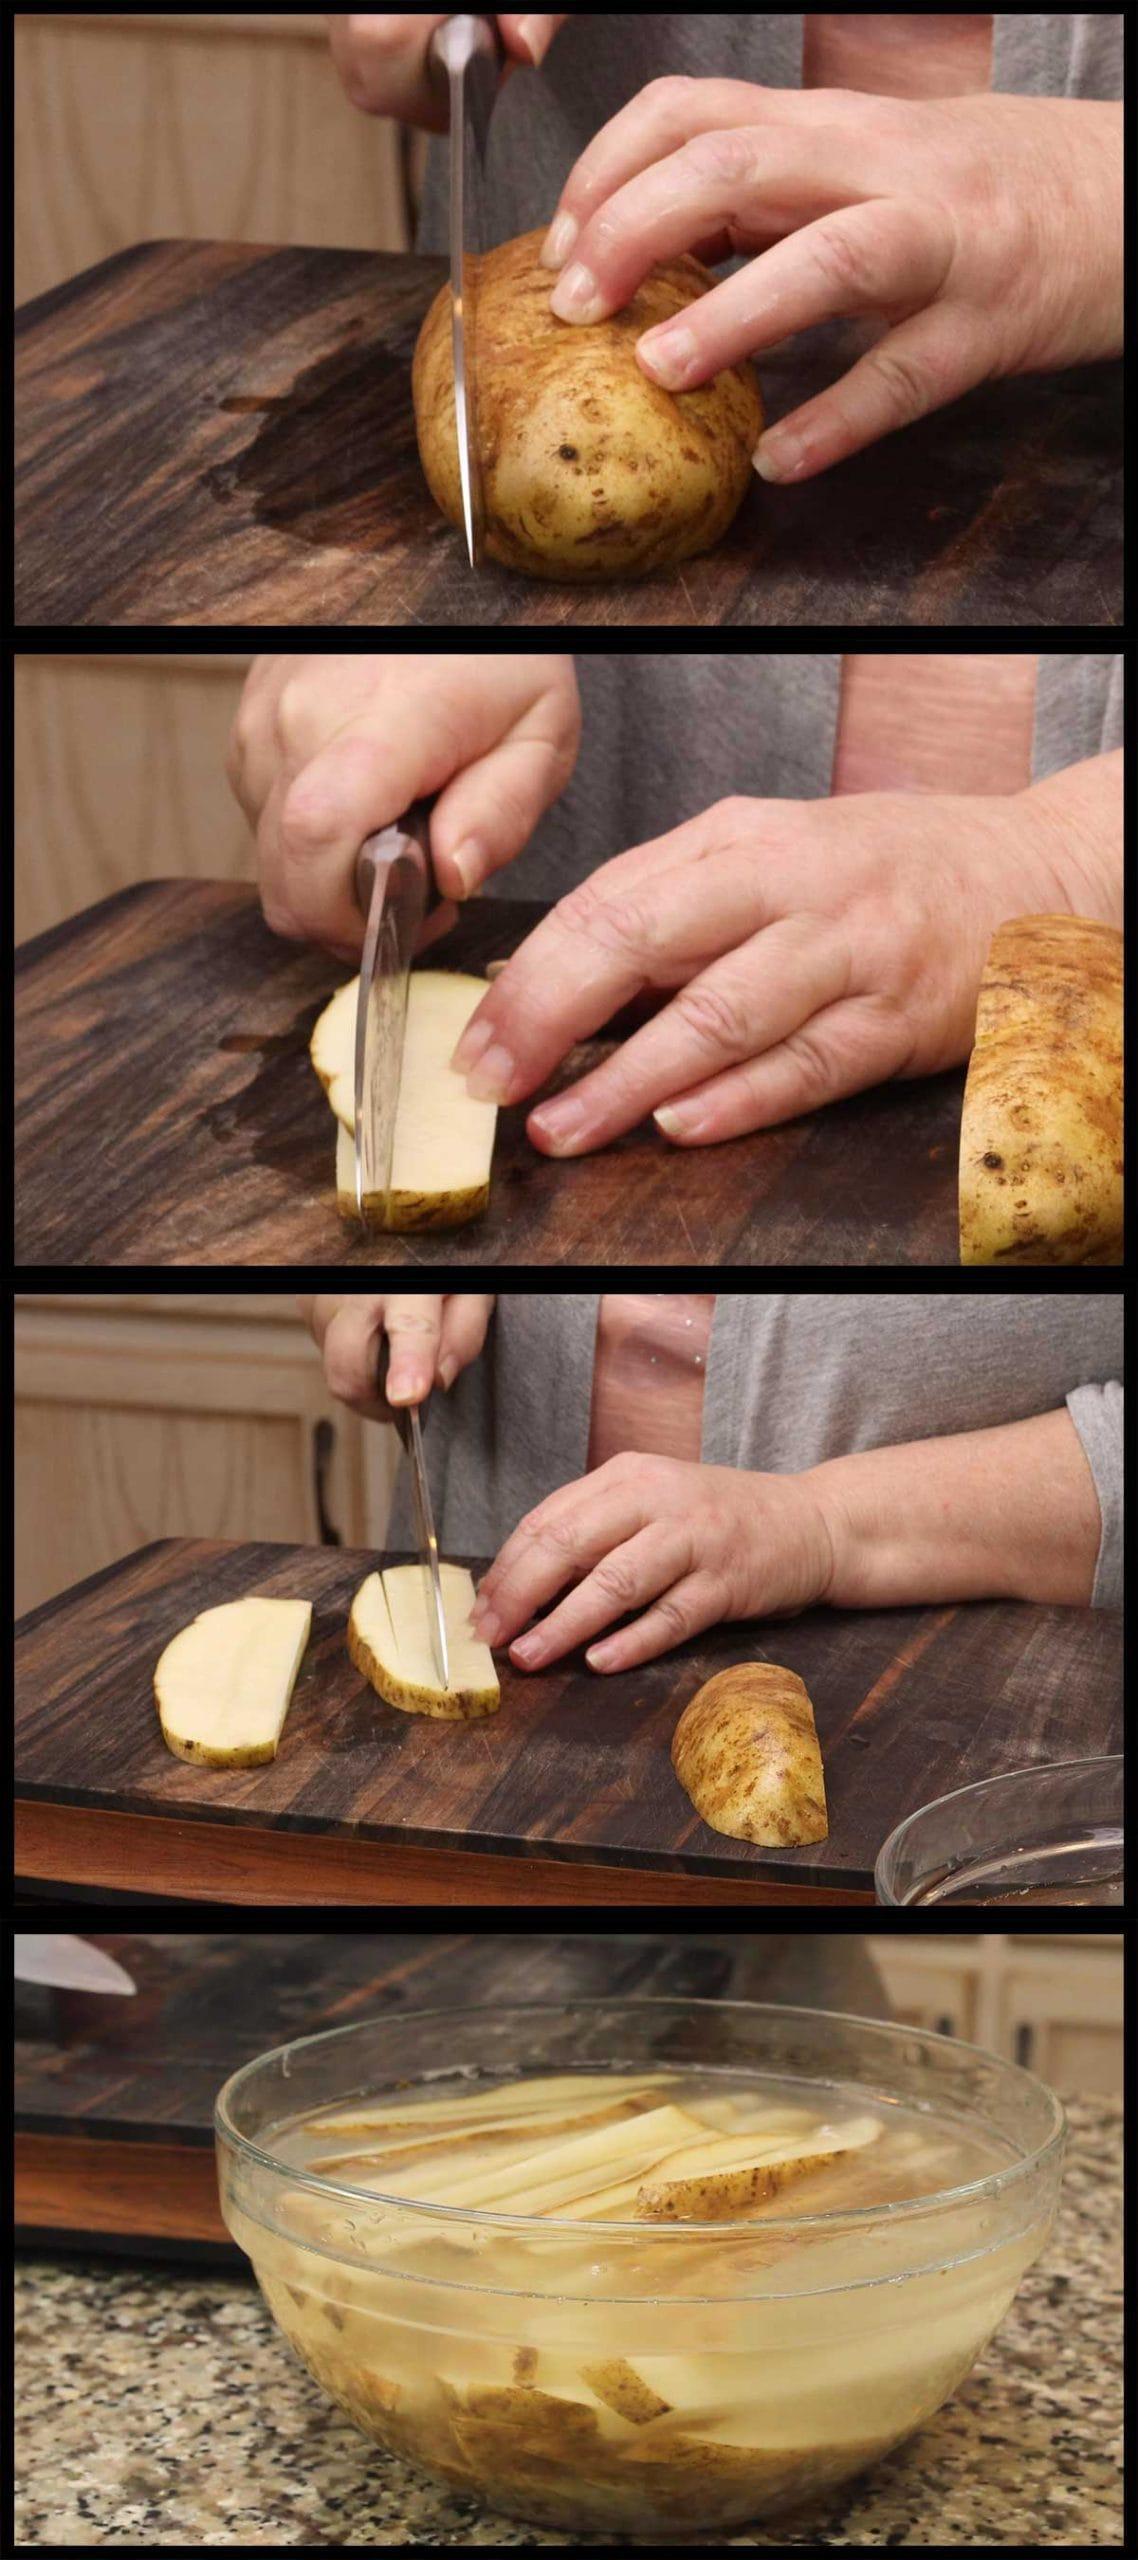 cutting the potatoes